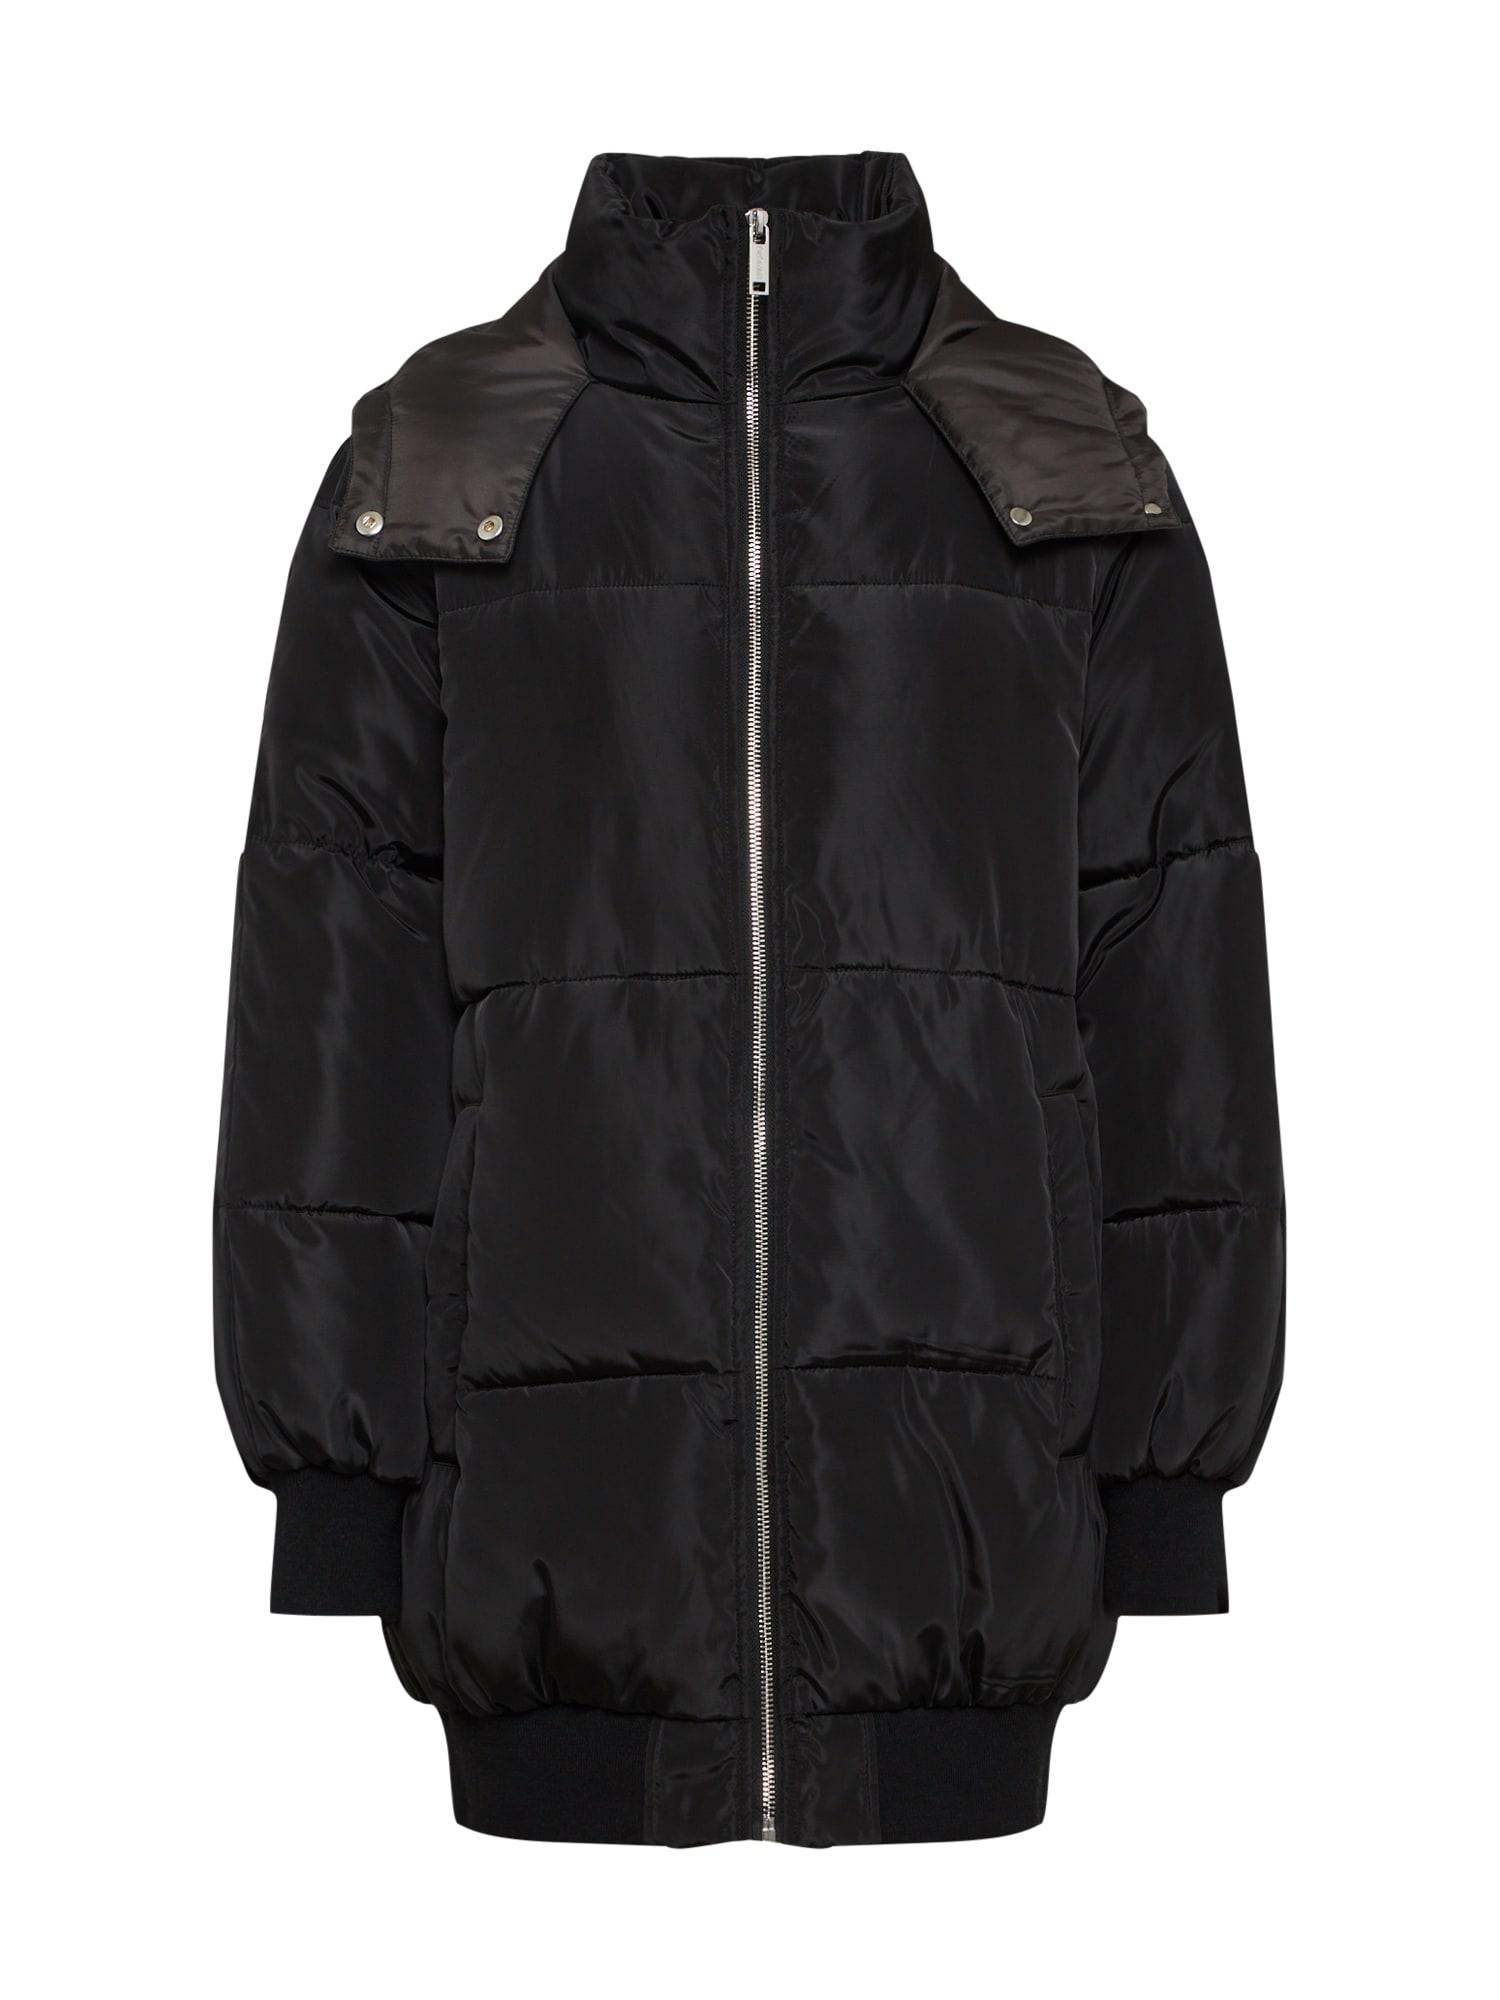 Zimní bunda Karen černá Wemoto